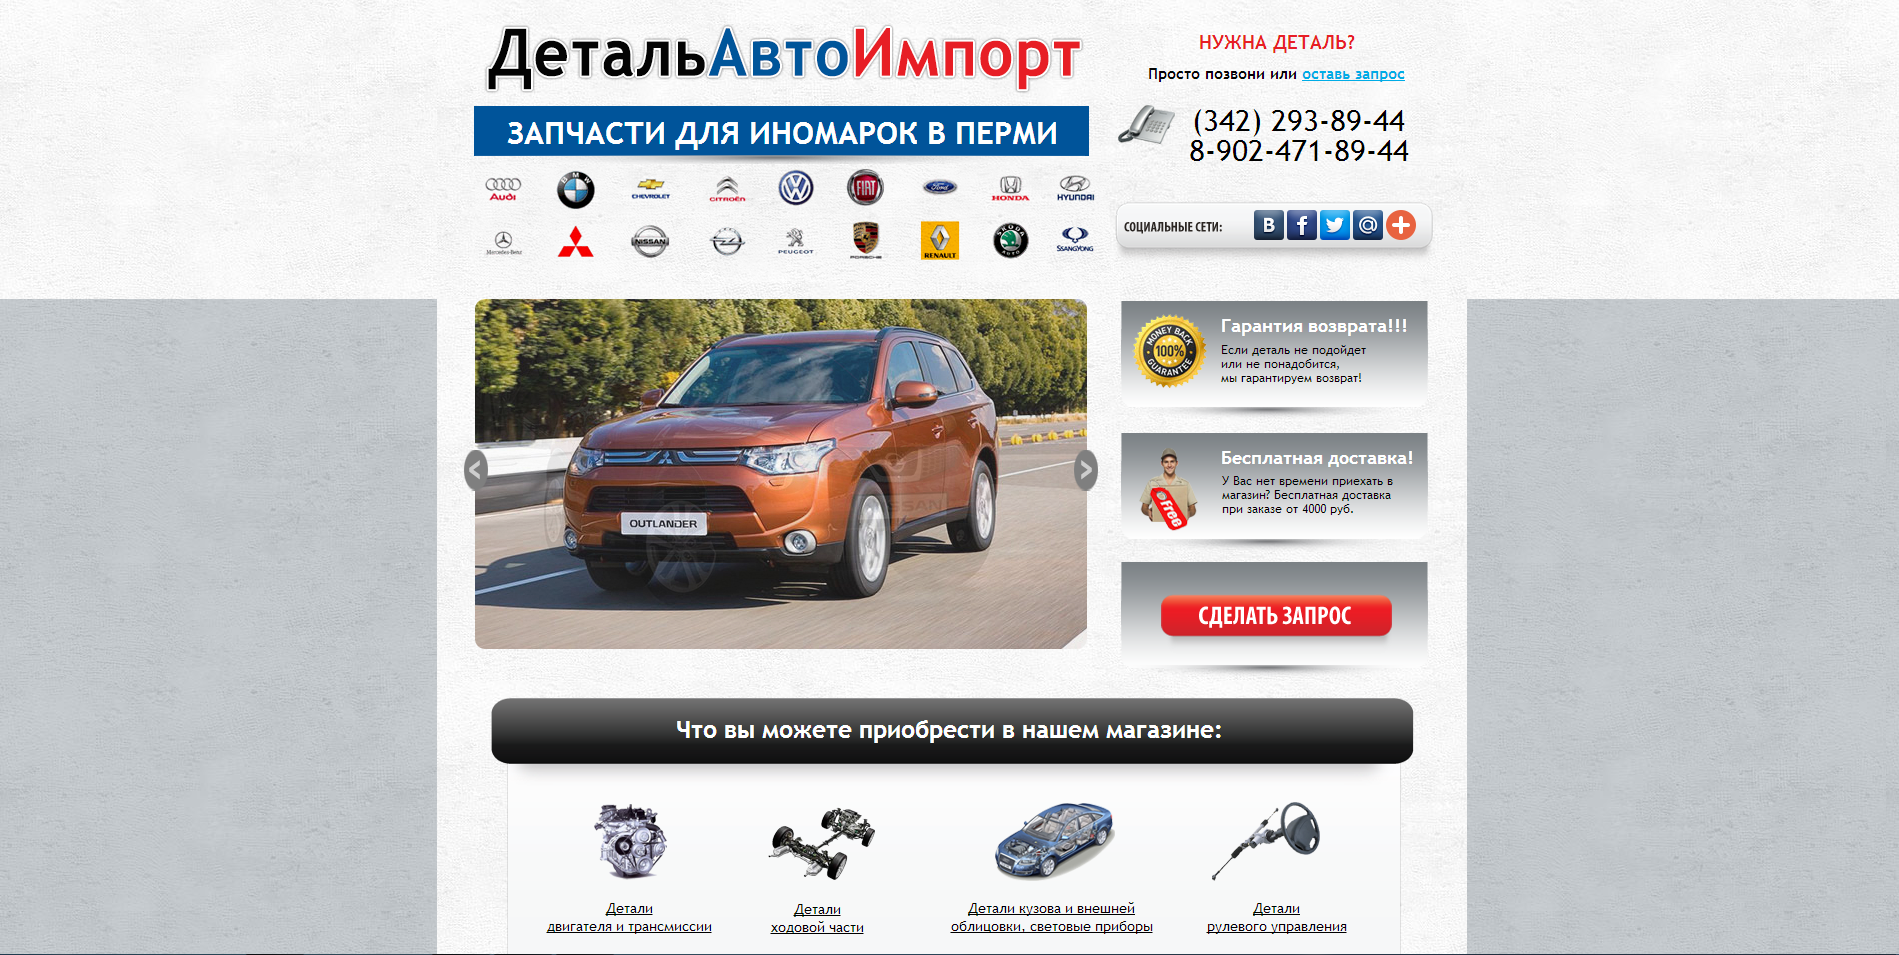 ДетальАвтоИмпорт иномарки (страница захвата)